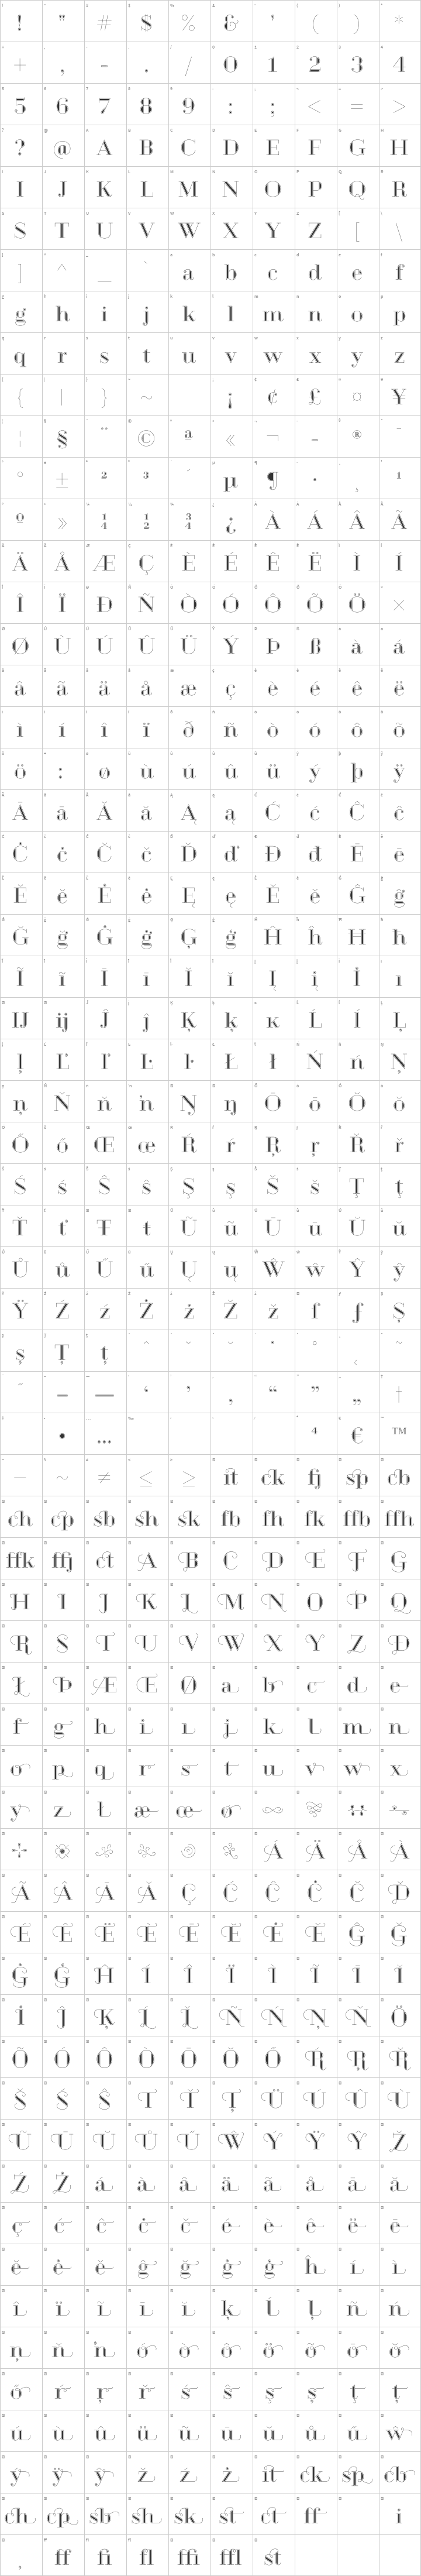 Geotica 2012 Glyph Map